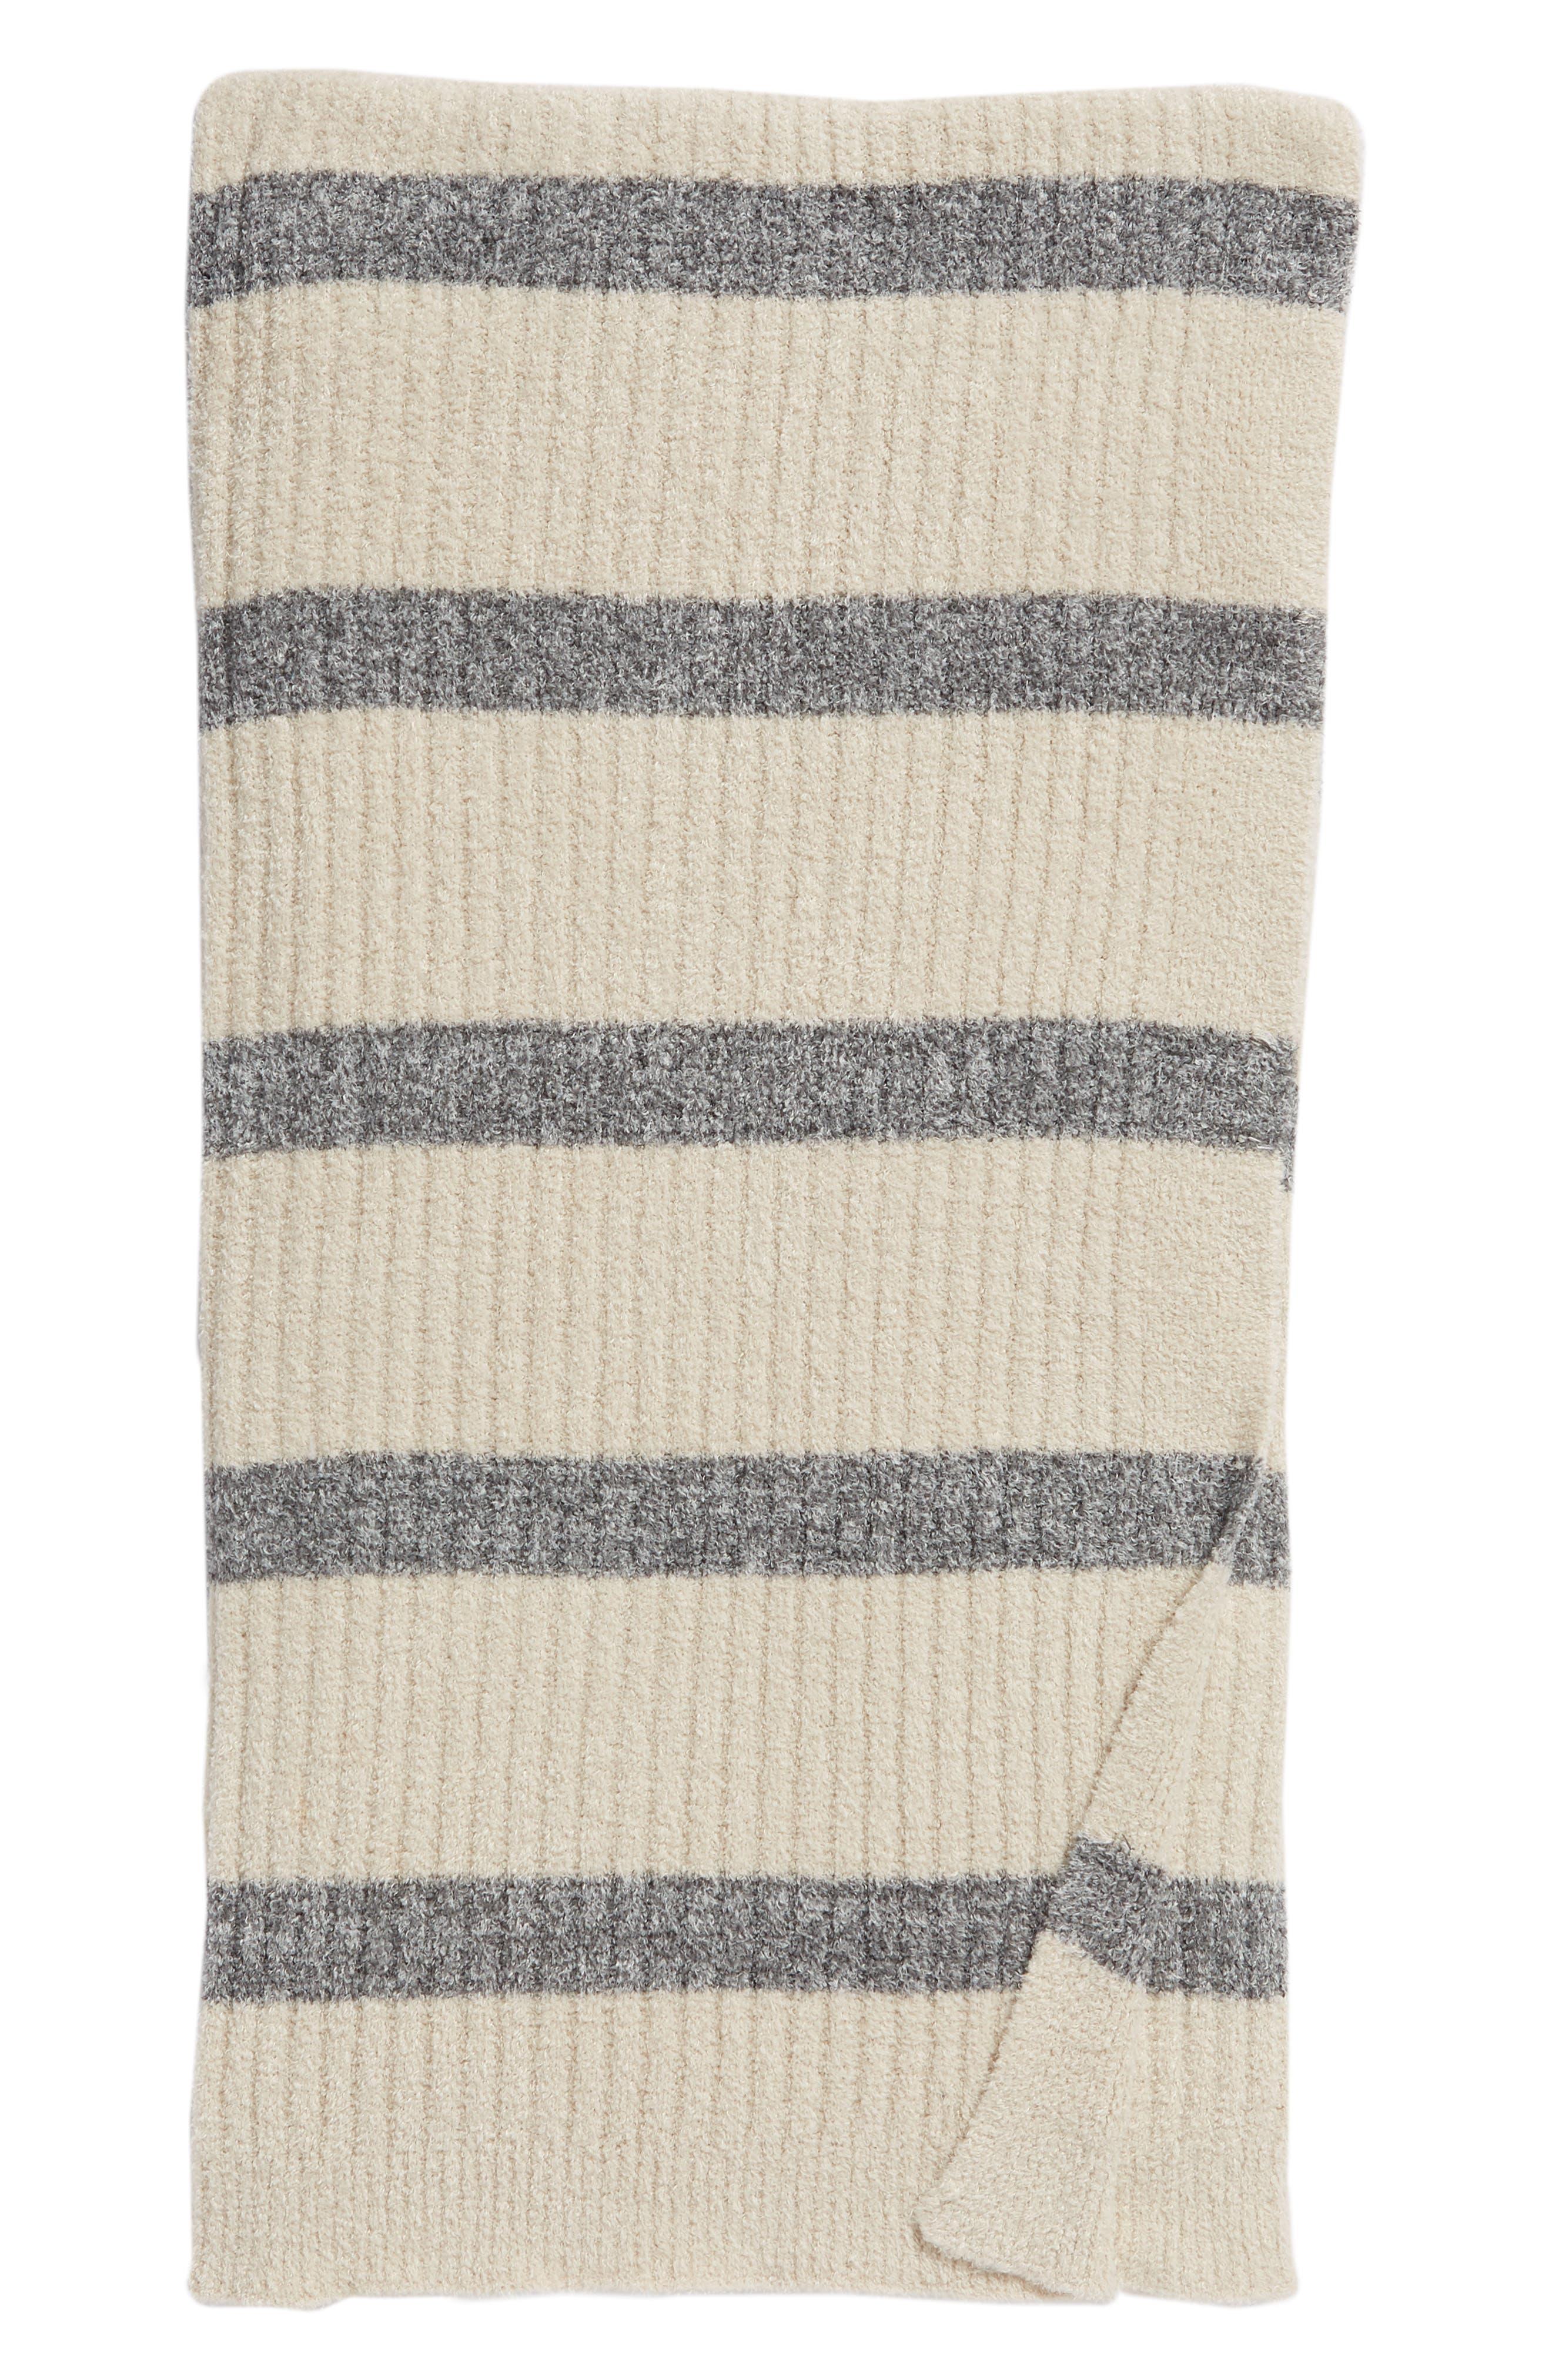 CozyChic Lite<sup>®</sup> Stripe Throw Blanket,                         Main,                         color, BISQUE/ GRAPHITE